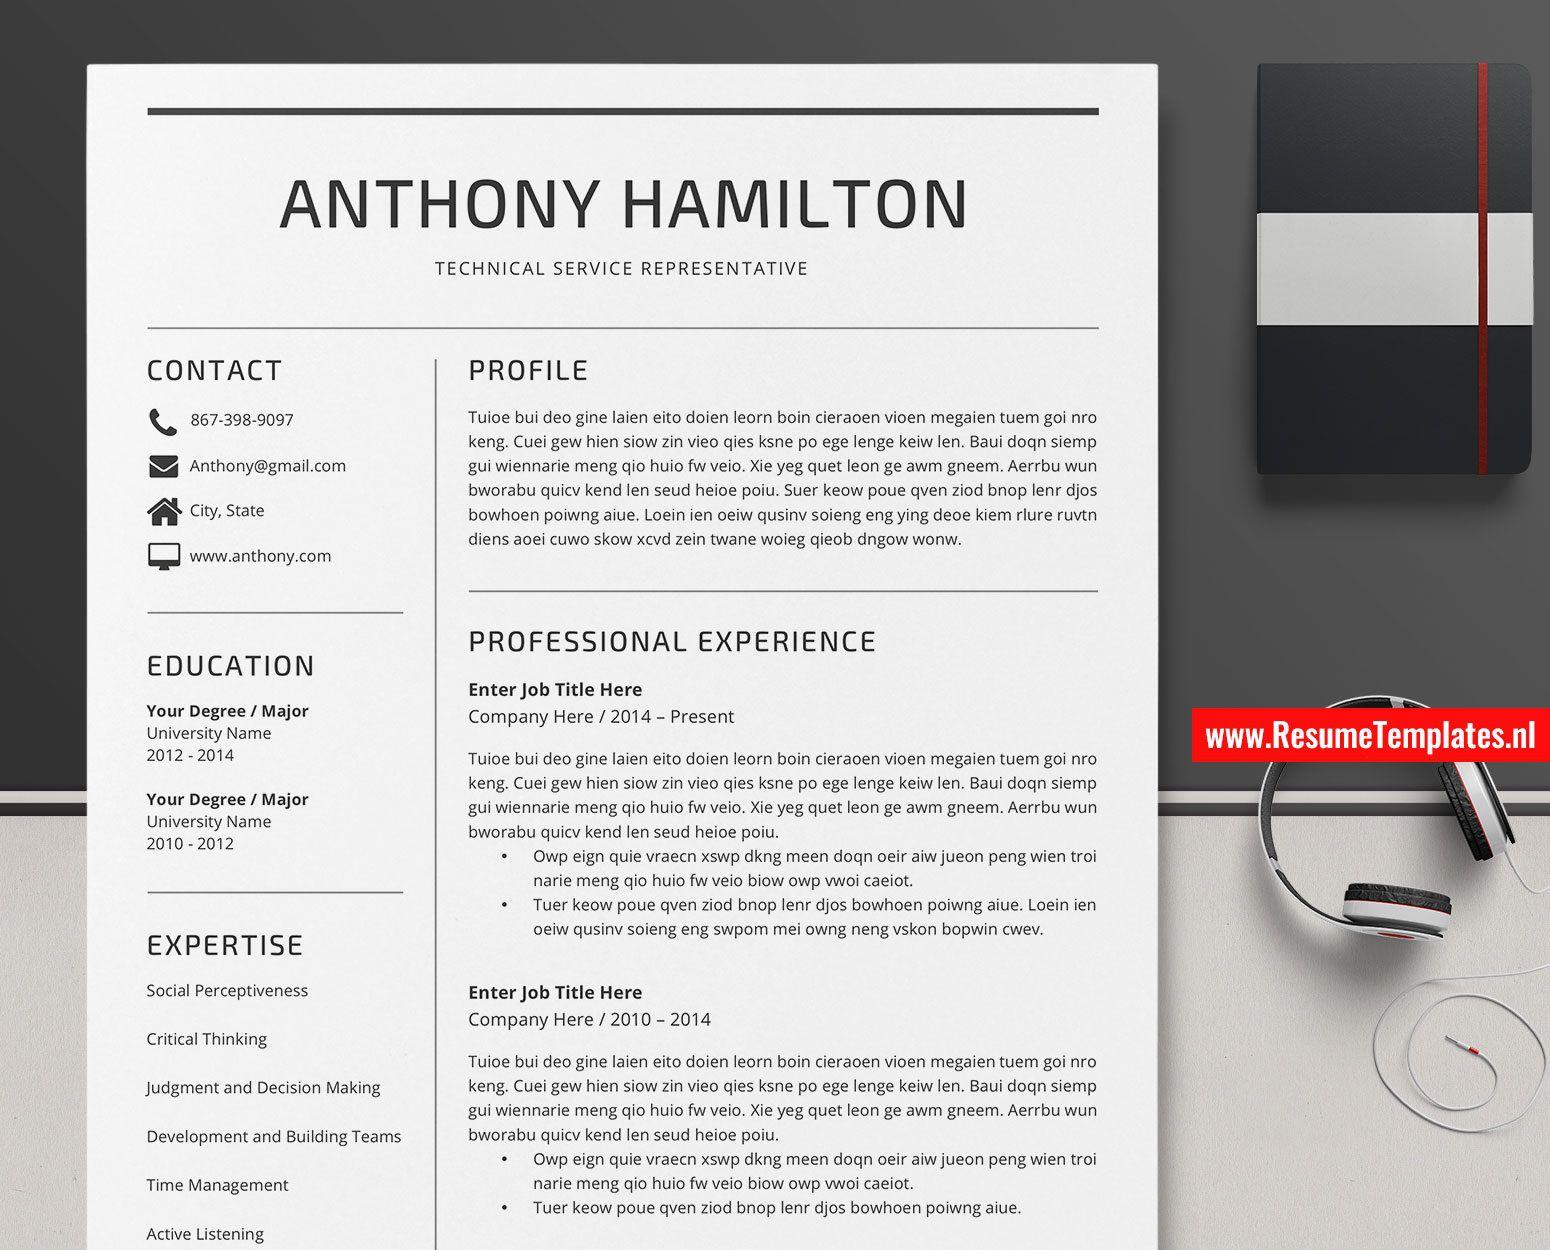 008 Awesome Microsoft Word Resume Template Sample  Reddit 2019 2010 Free DownloadFull